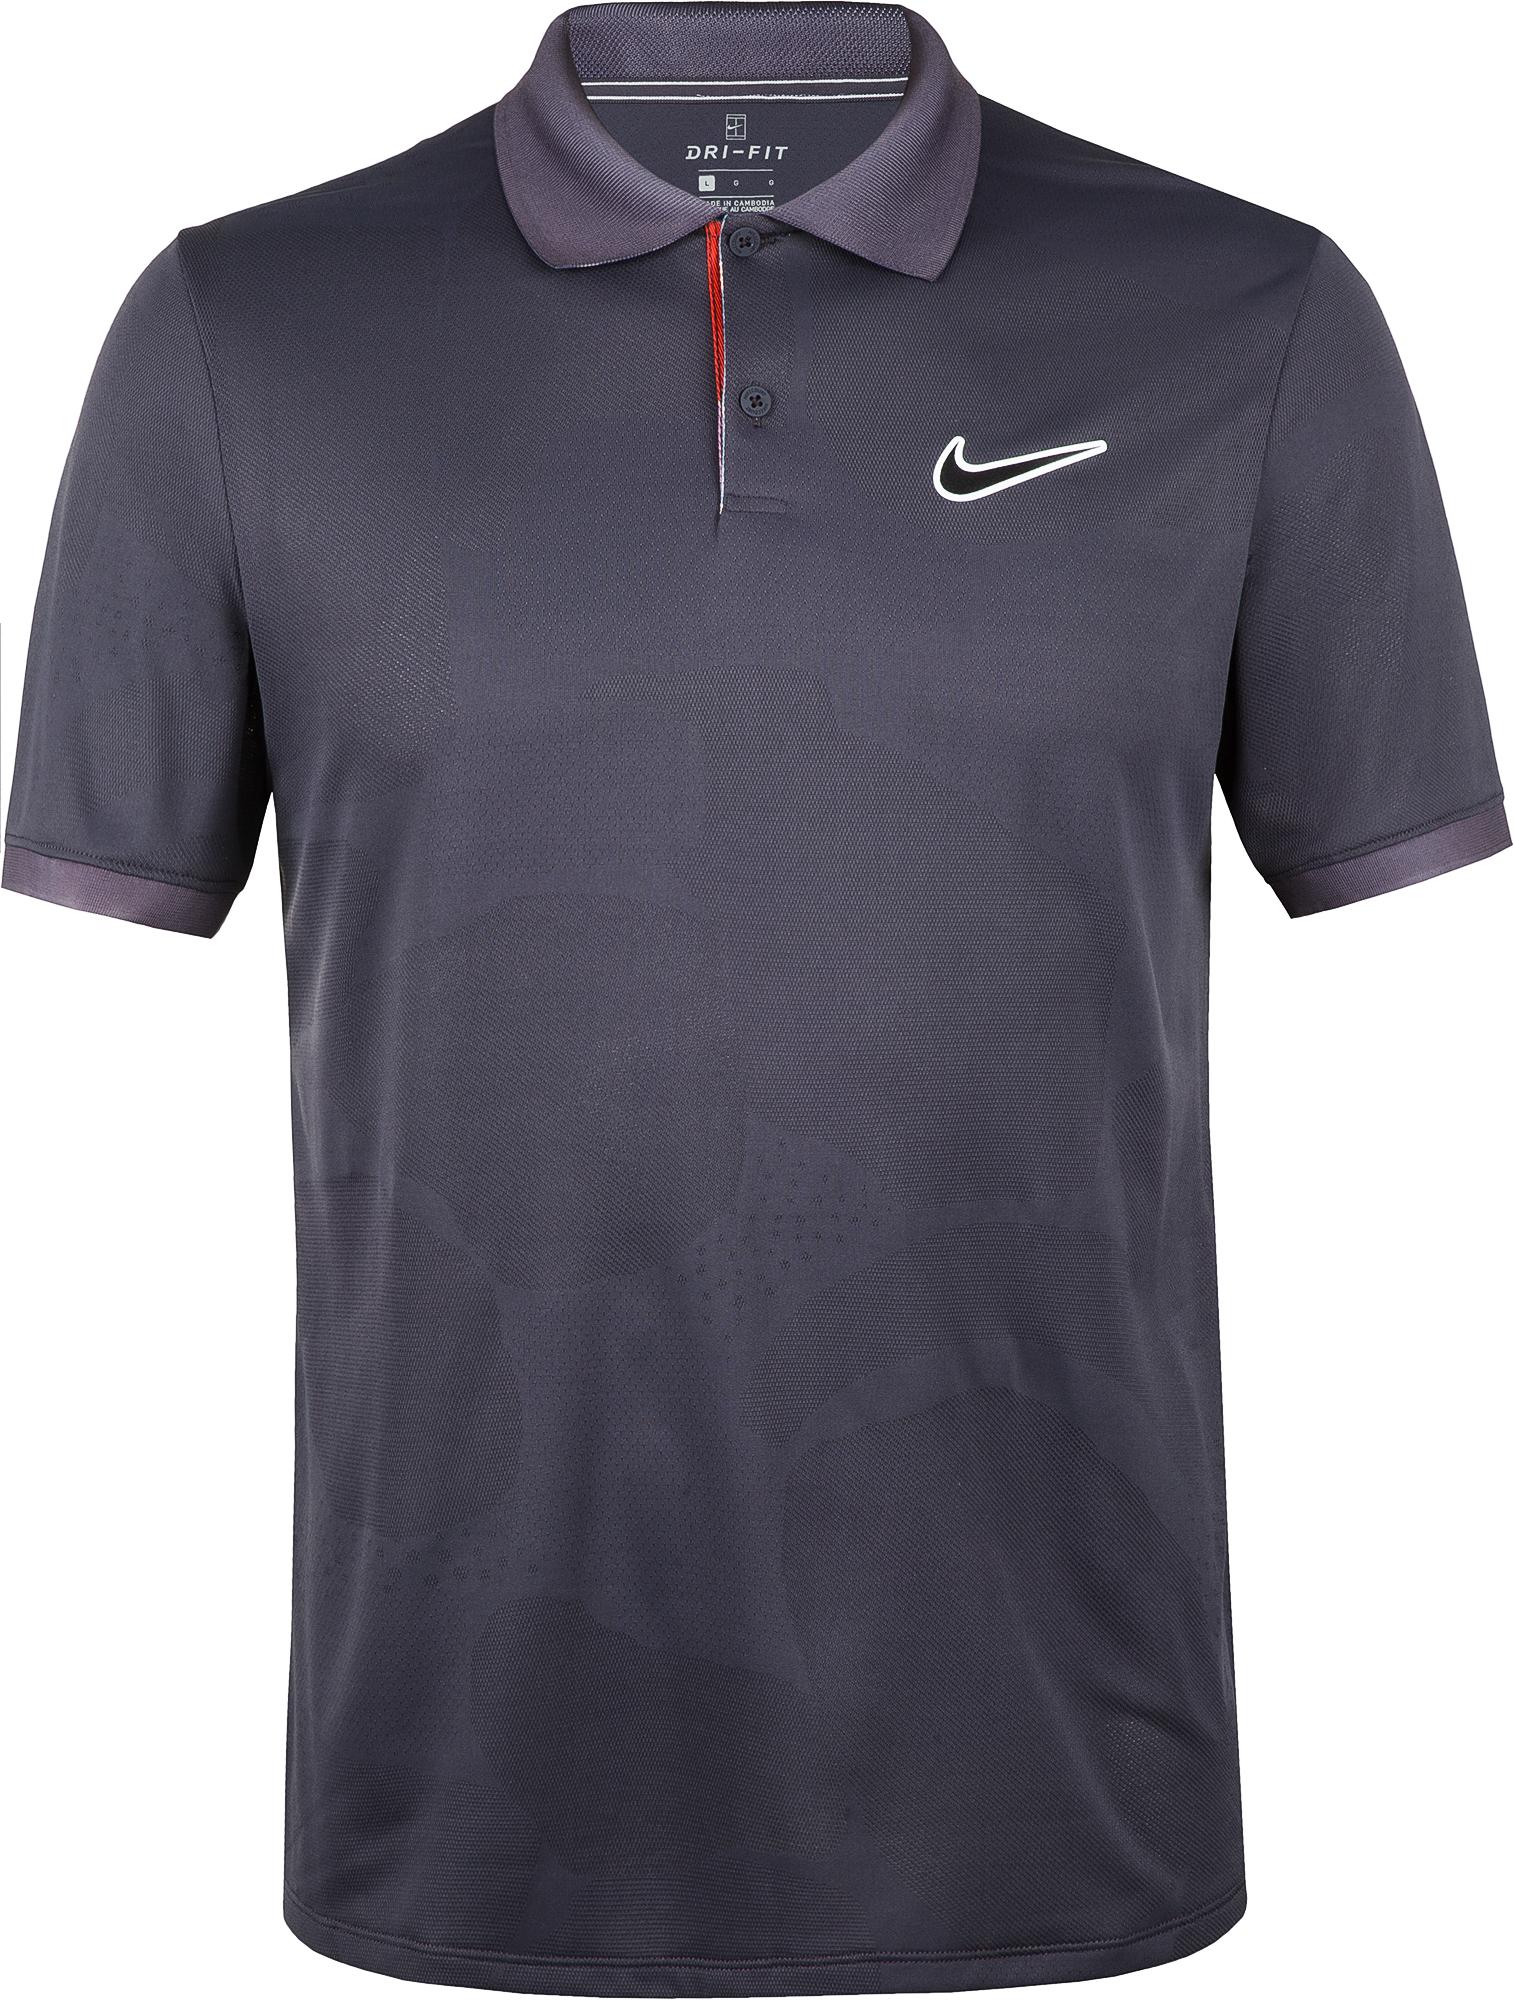 Nike Поло мужское Nike Court Breathe Advantage, размер 52-54 поло мужское rav цвет коричневый белый rav01 021 размер xl 52